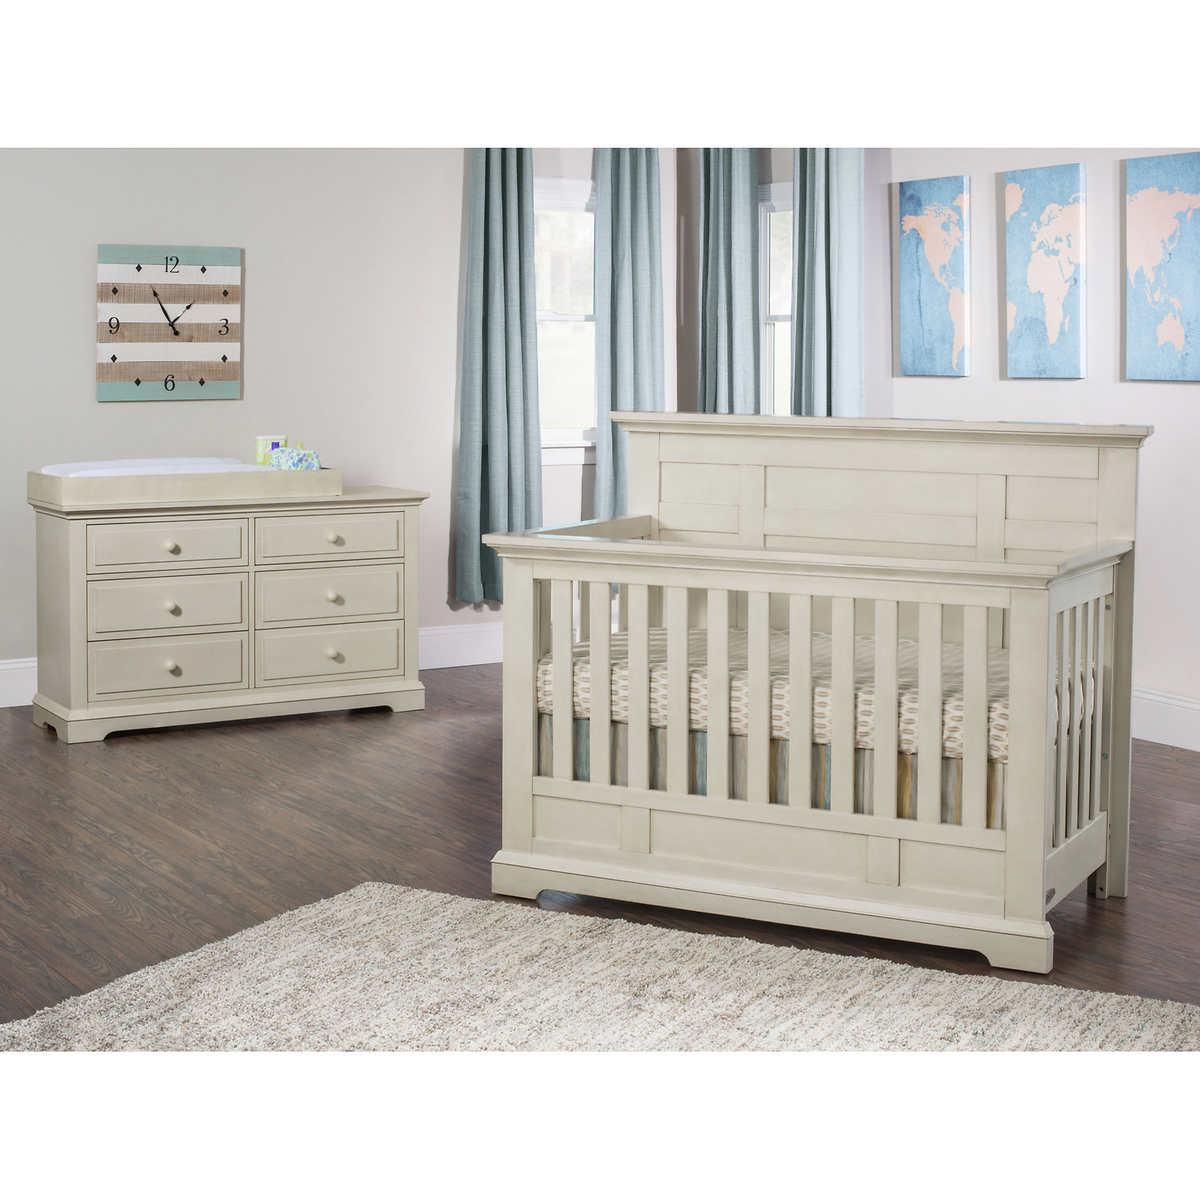 Addison flat top crib 2 piece nursery collection